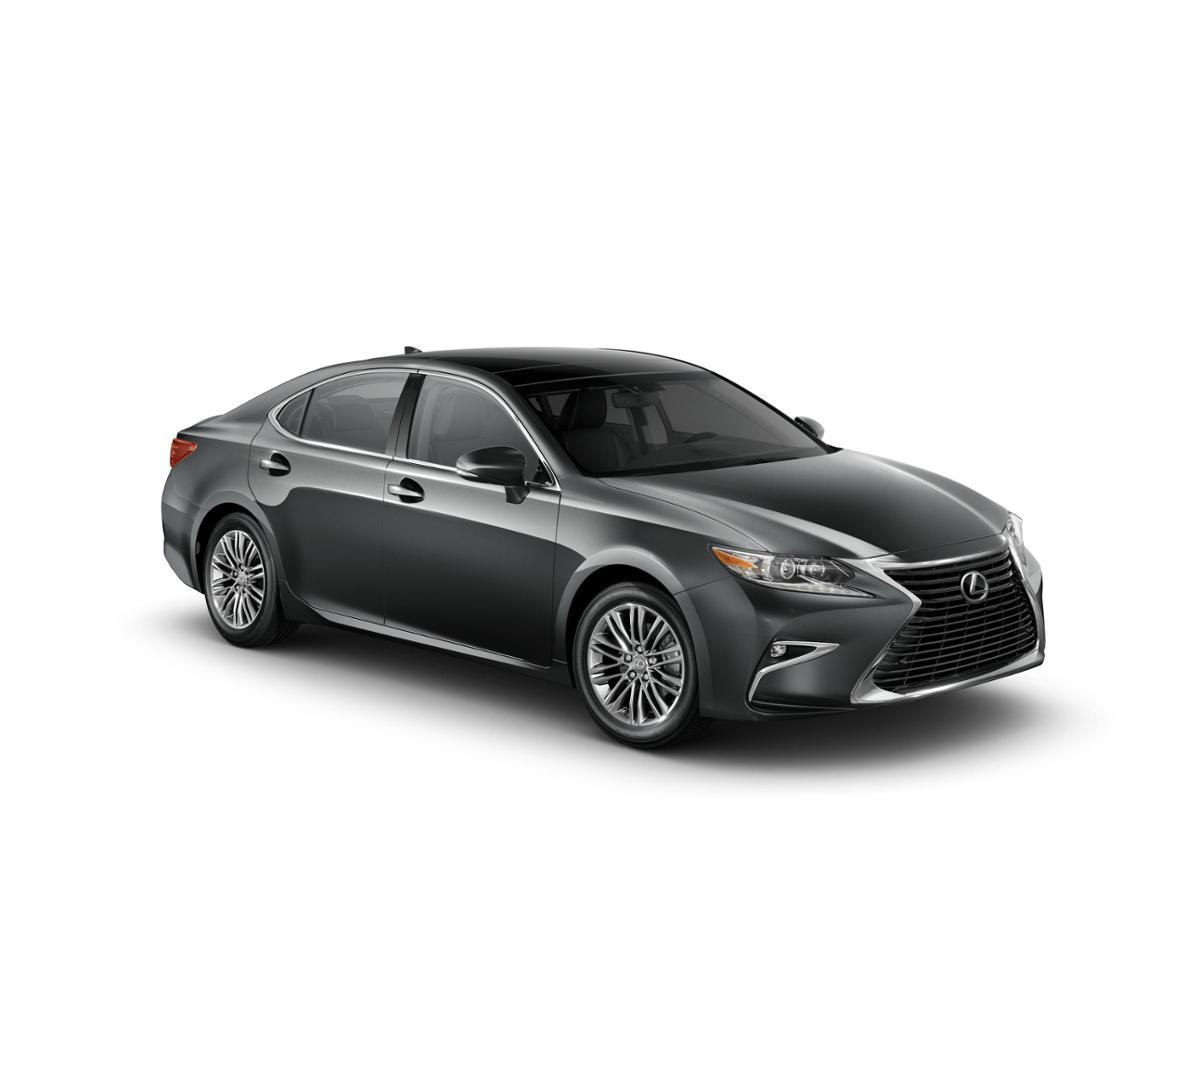 2016 Lexus Es 350 For Sale In San Juan 58abk1gg7gu035606